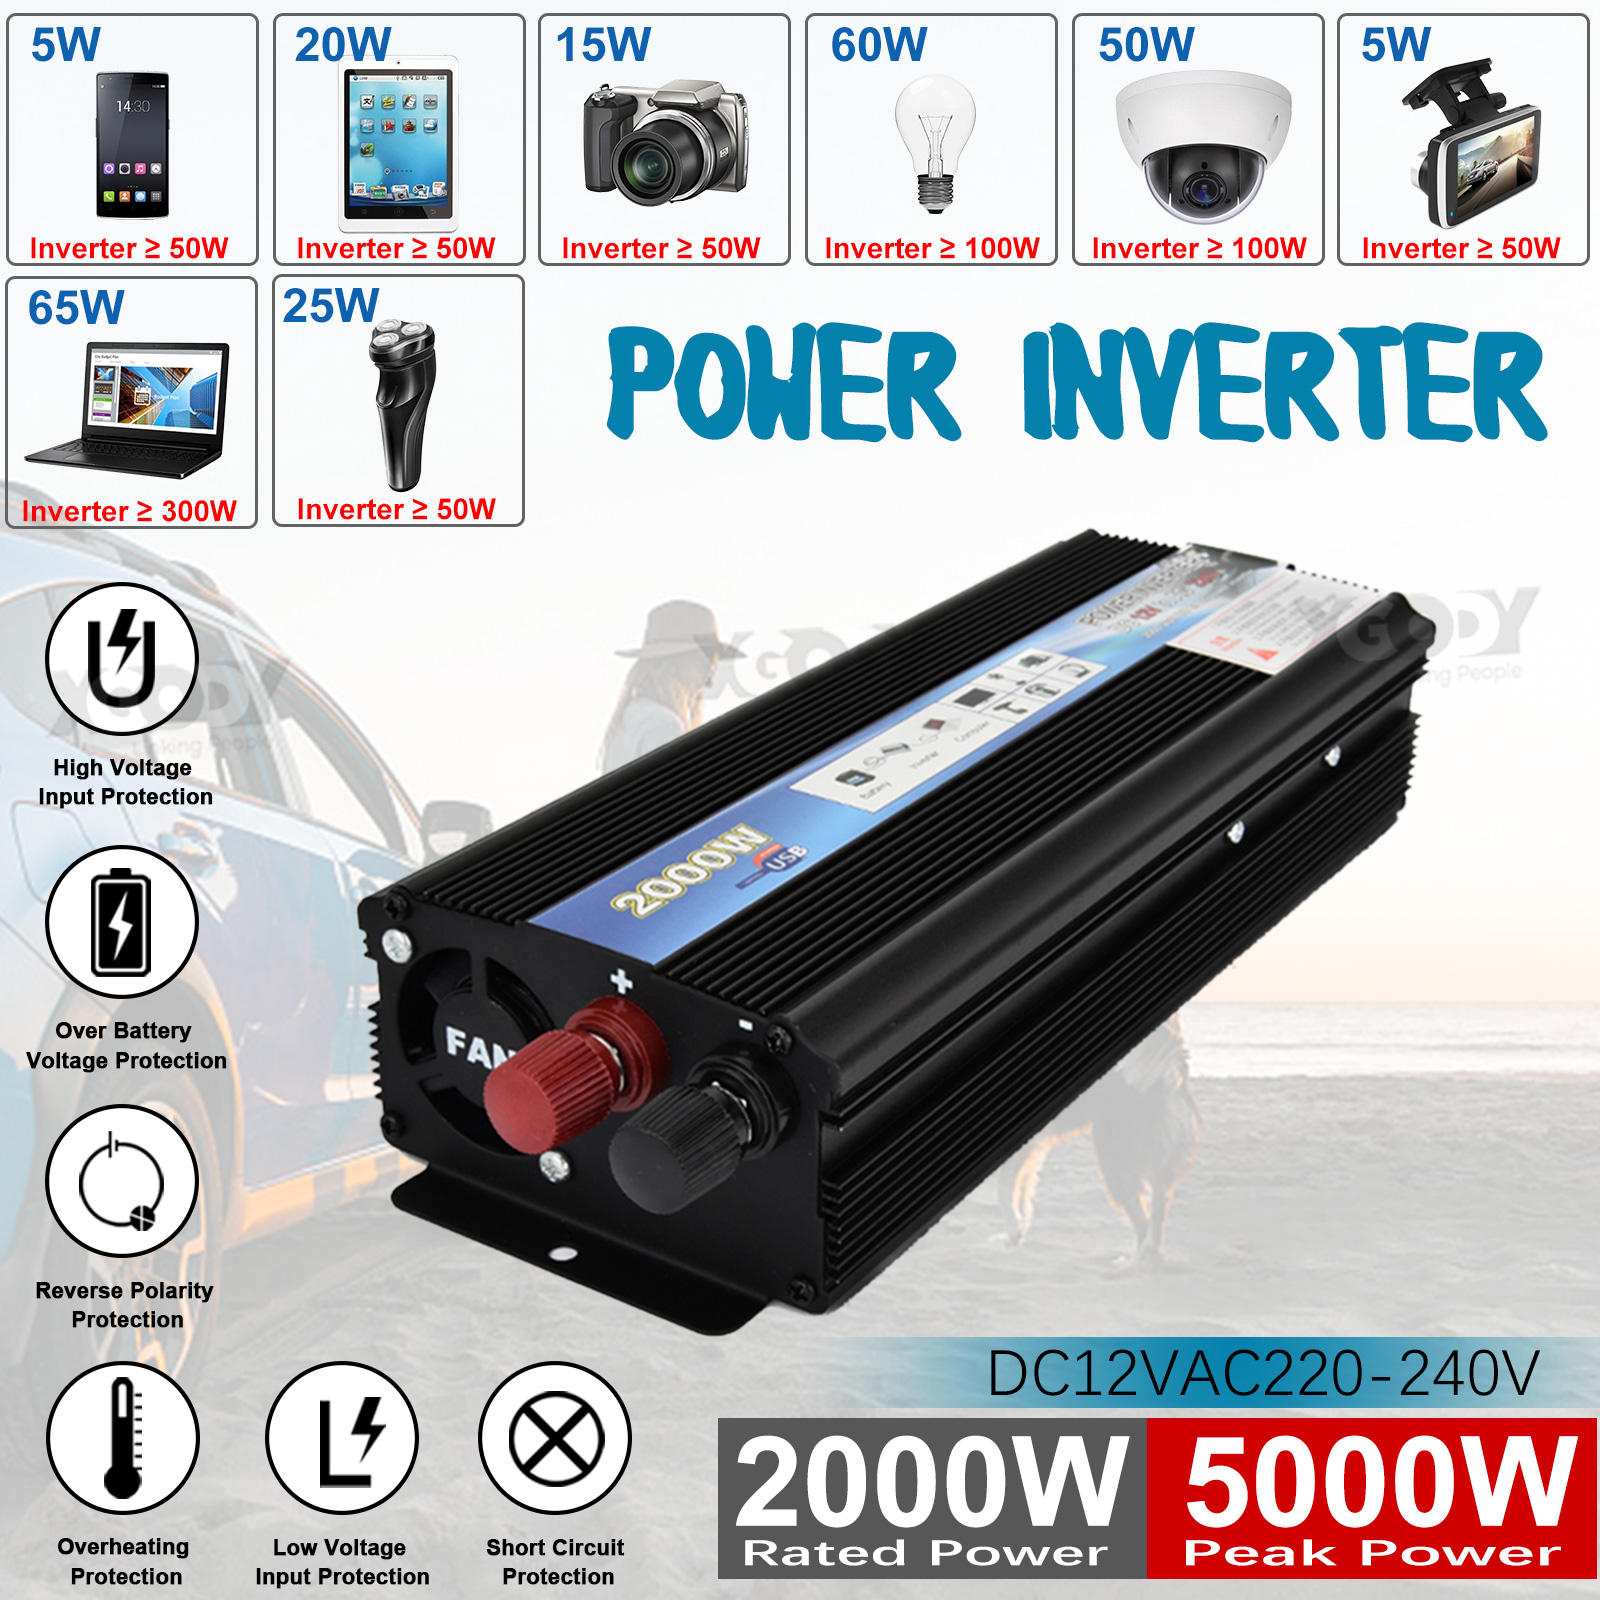 hight resolution of 2000w car solar power inverter dc12v to ac110v sine wave converter sine wave power inverter with charger 12v 220v 5000w circuit diagram